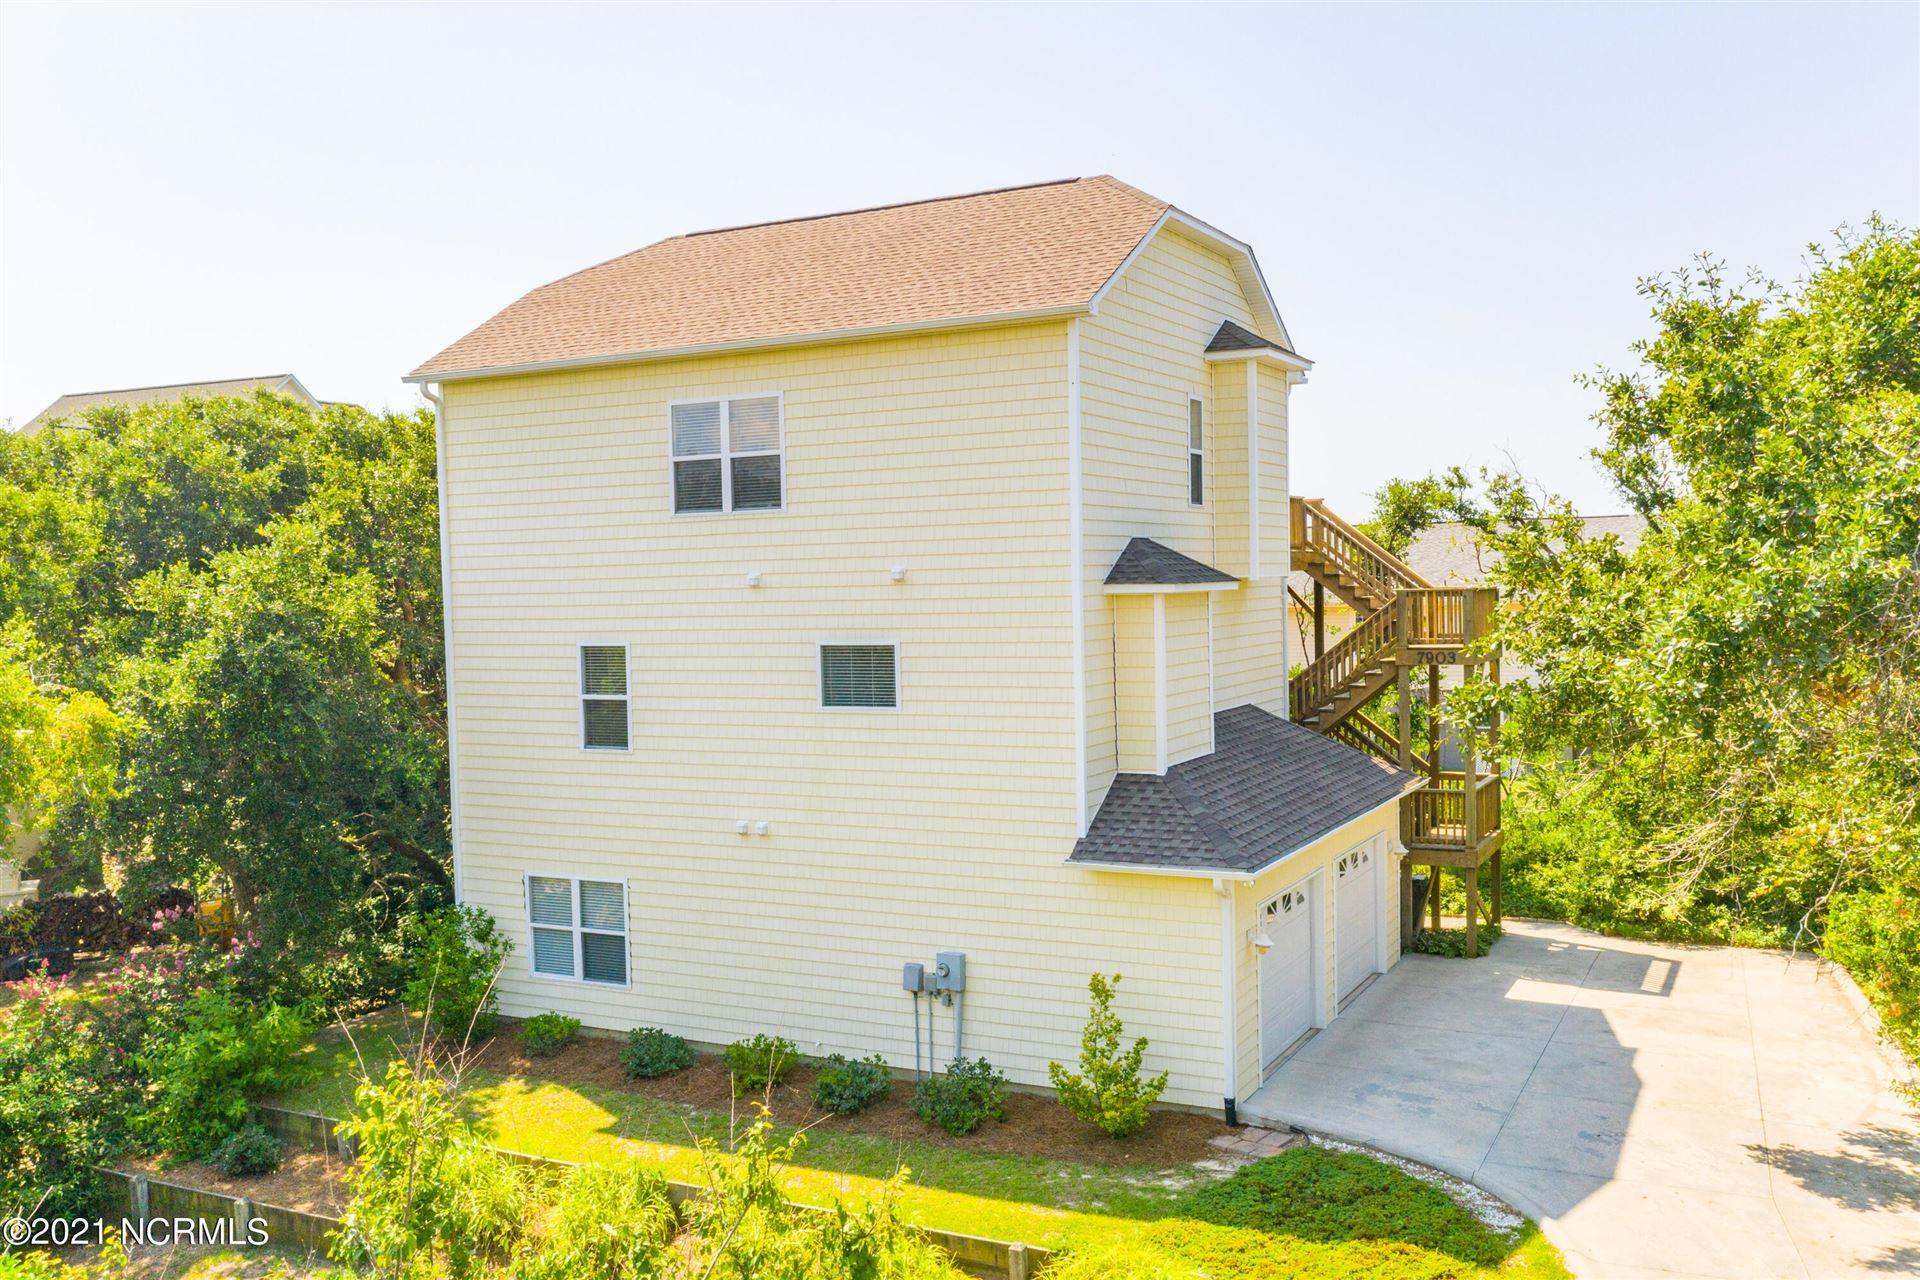 Photo of 7903 Forest Drive, Emerald Isle, NC 28594 (MLS # 100285344)